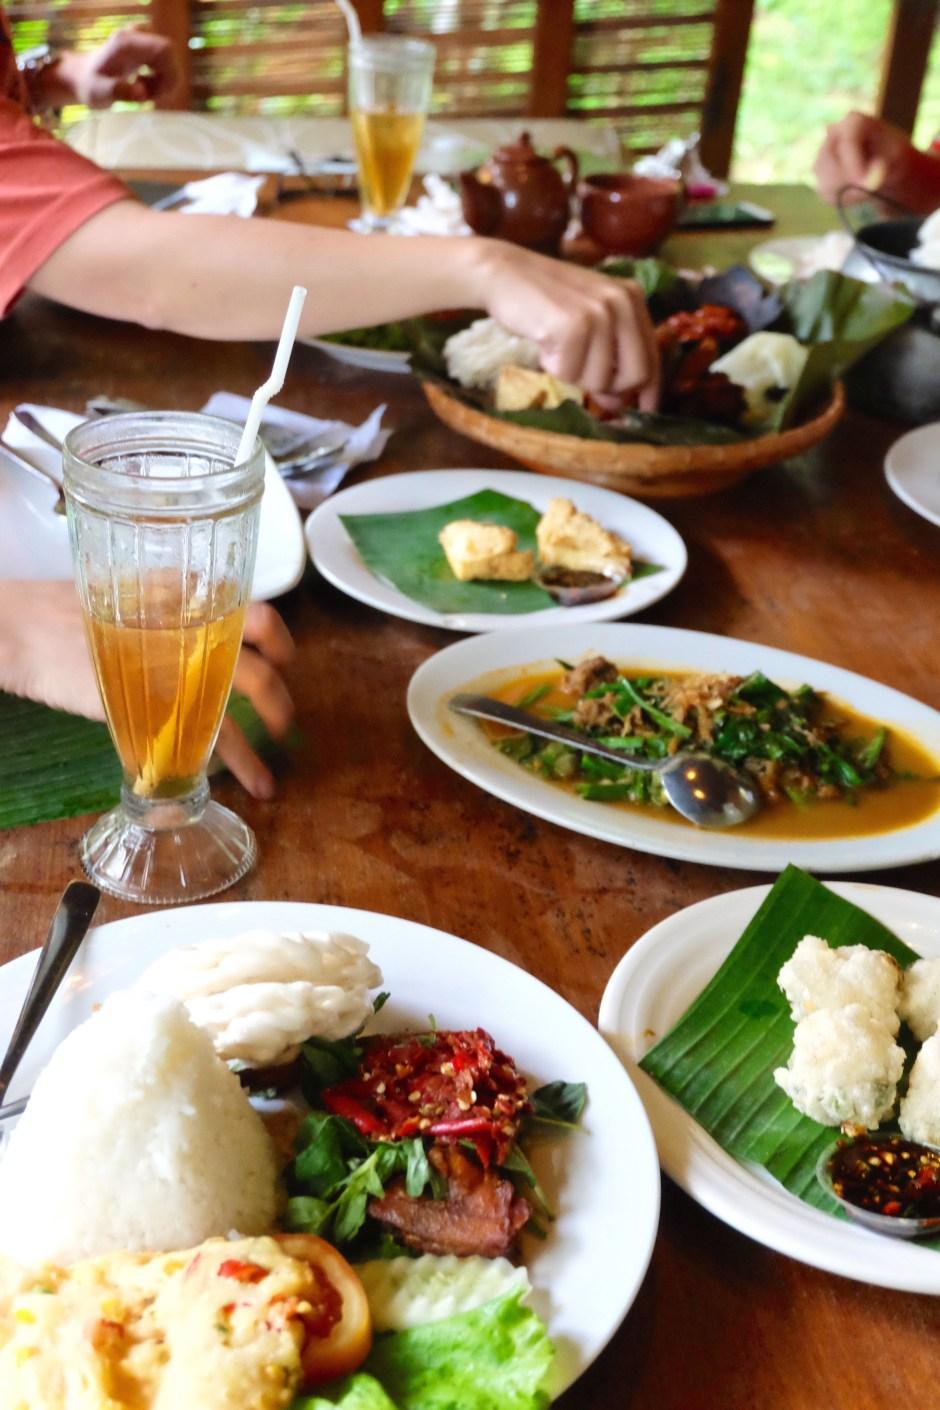 Lunch at Kampung Daun